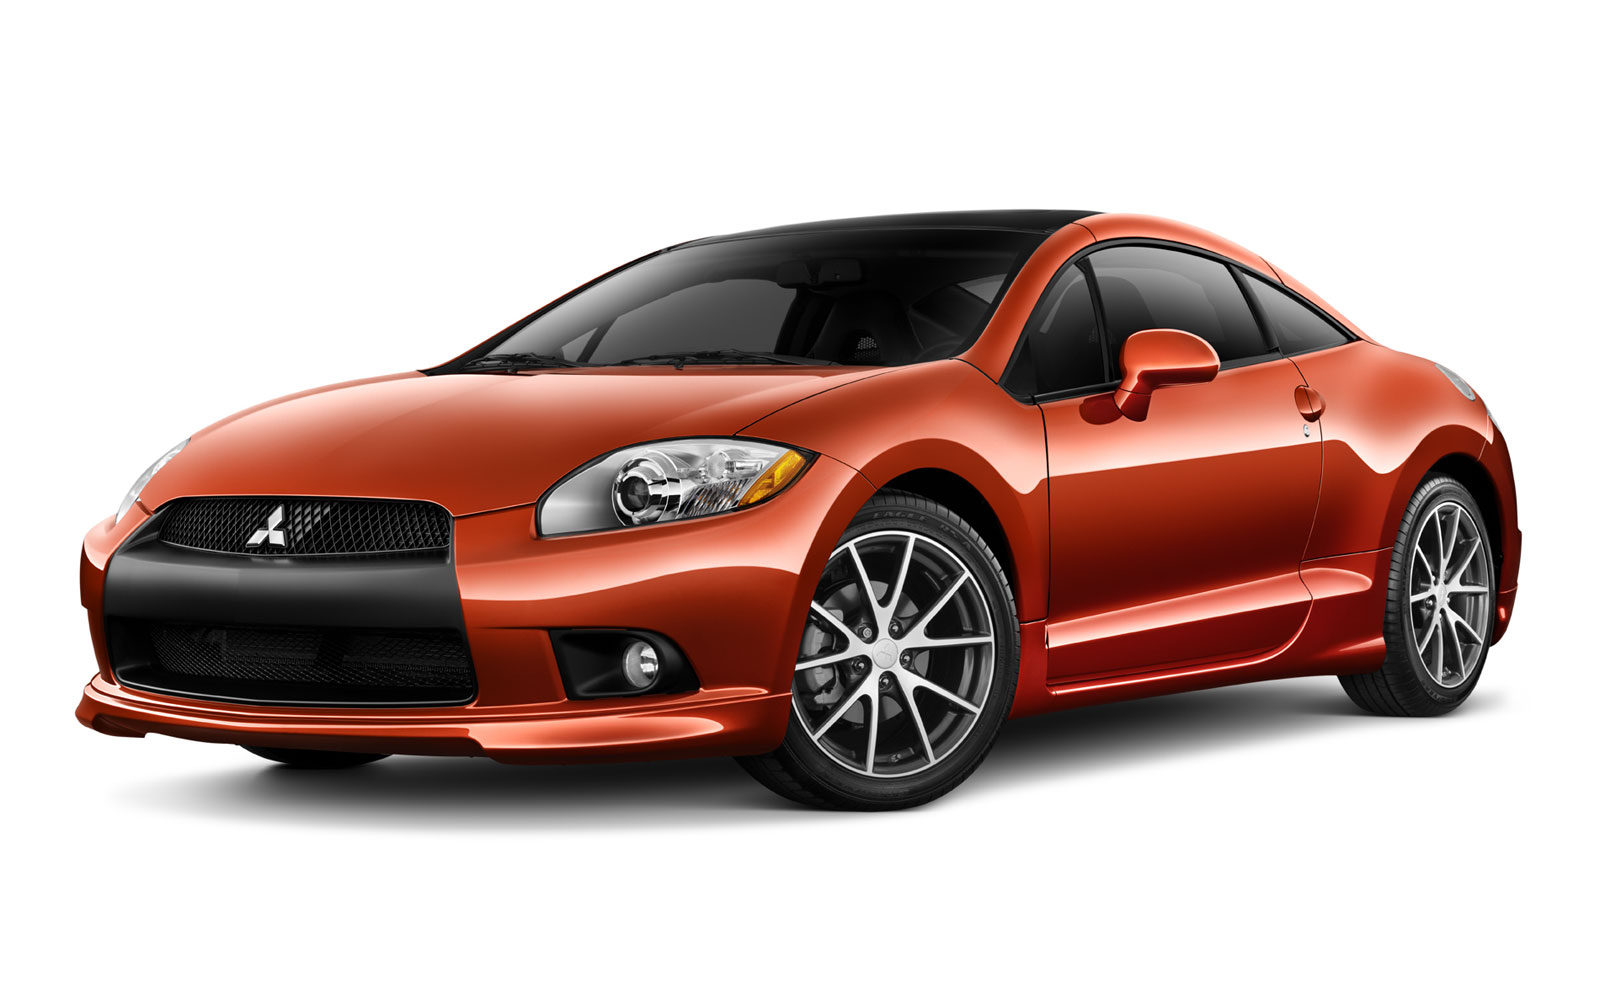 2011+Mitsubishi+Eclipse+GS+Sport+Pictures - 2011 Mitsubishi Eclipse Gs Sport